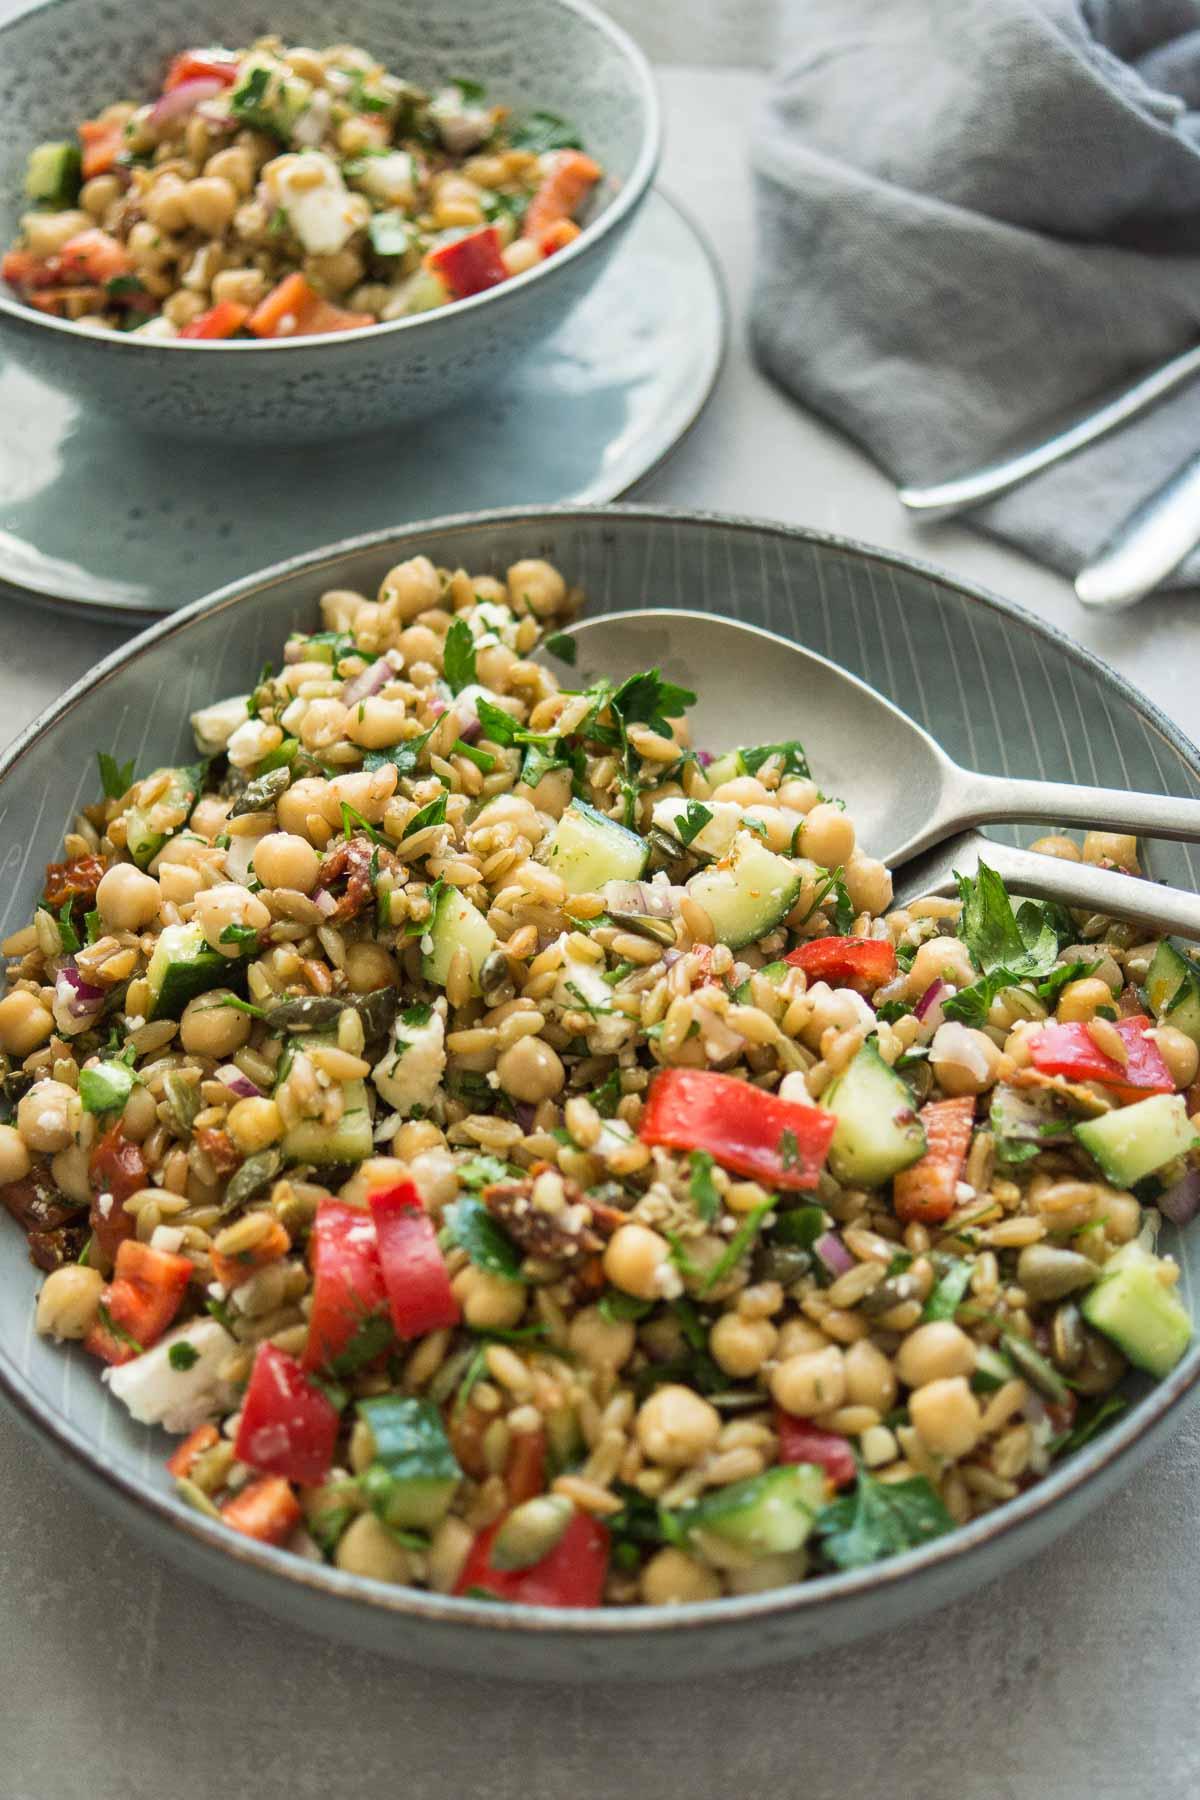 Rezept für Grünkernsalat griechischer Art mit Kichererbsen, Feta, Paprika, Gurke, Kräuter